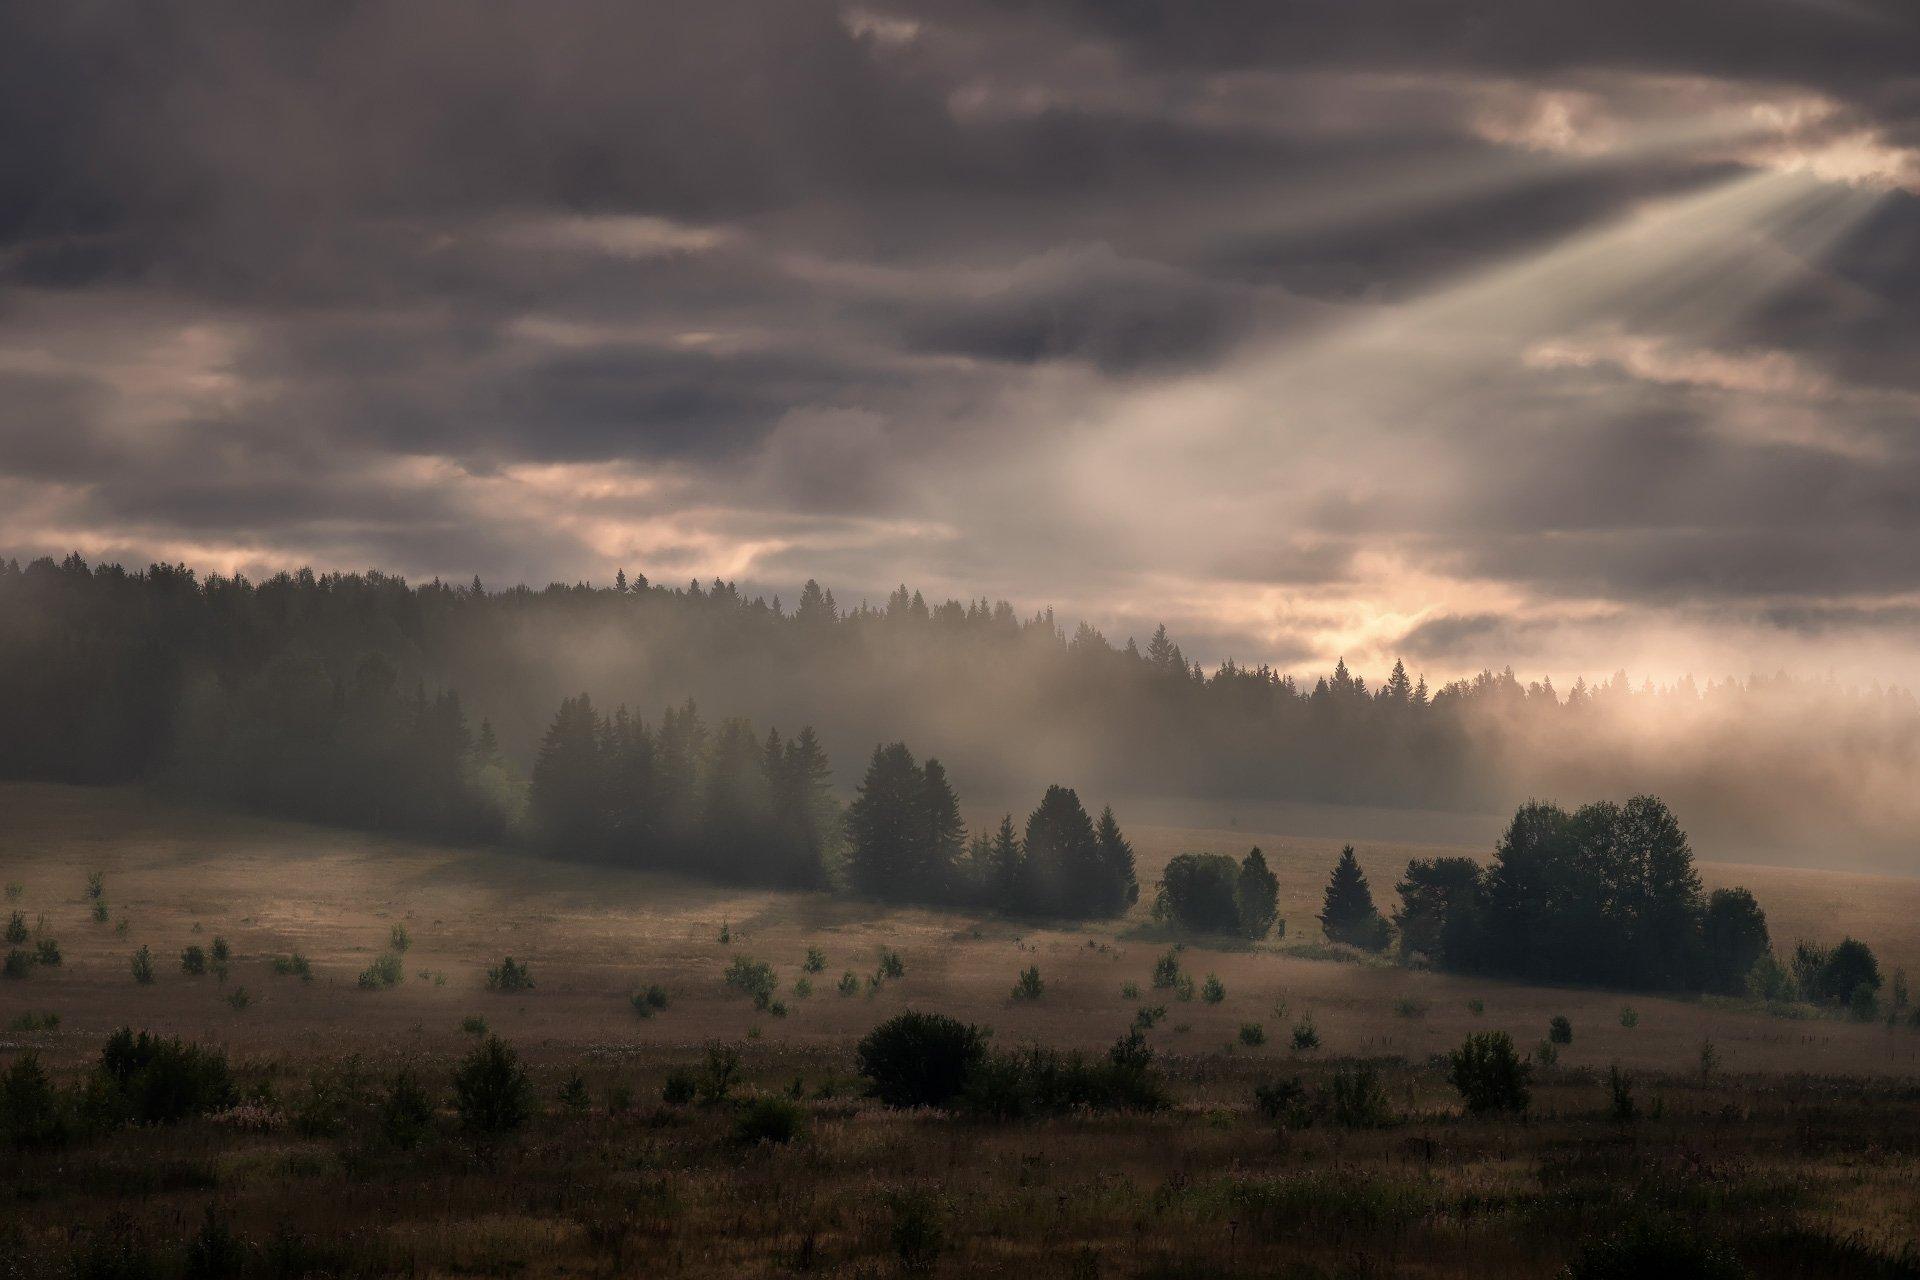 пейзаж, перемское, пермский край, утро, облачно, луч, солнце, тайга, лес, елки, поле, Андрей Чиж